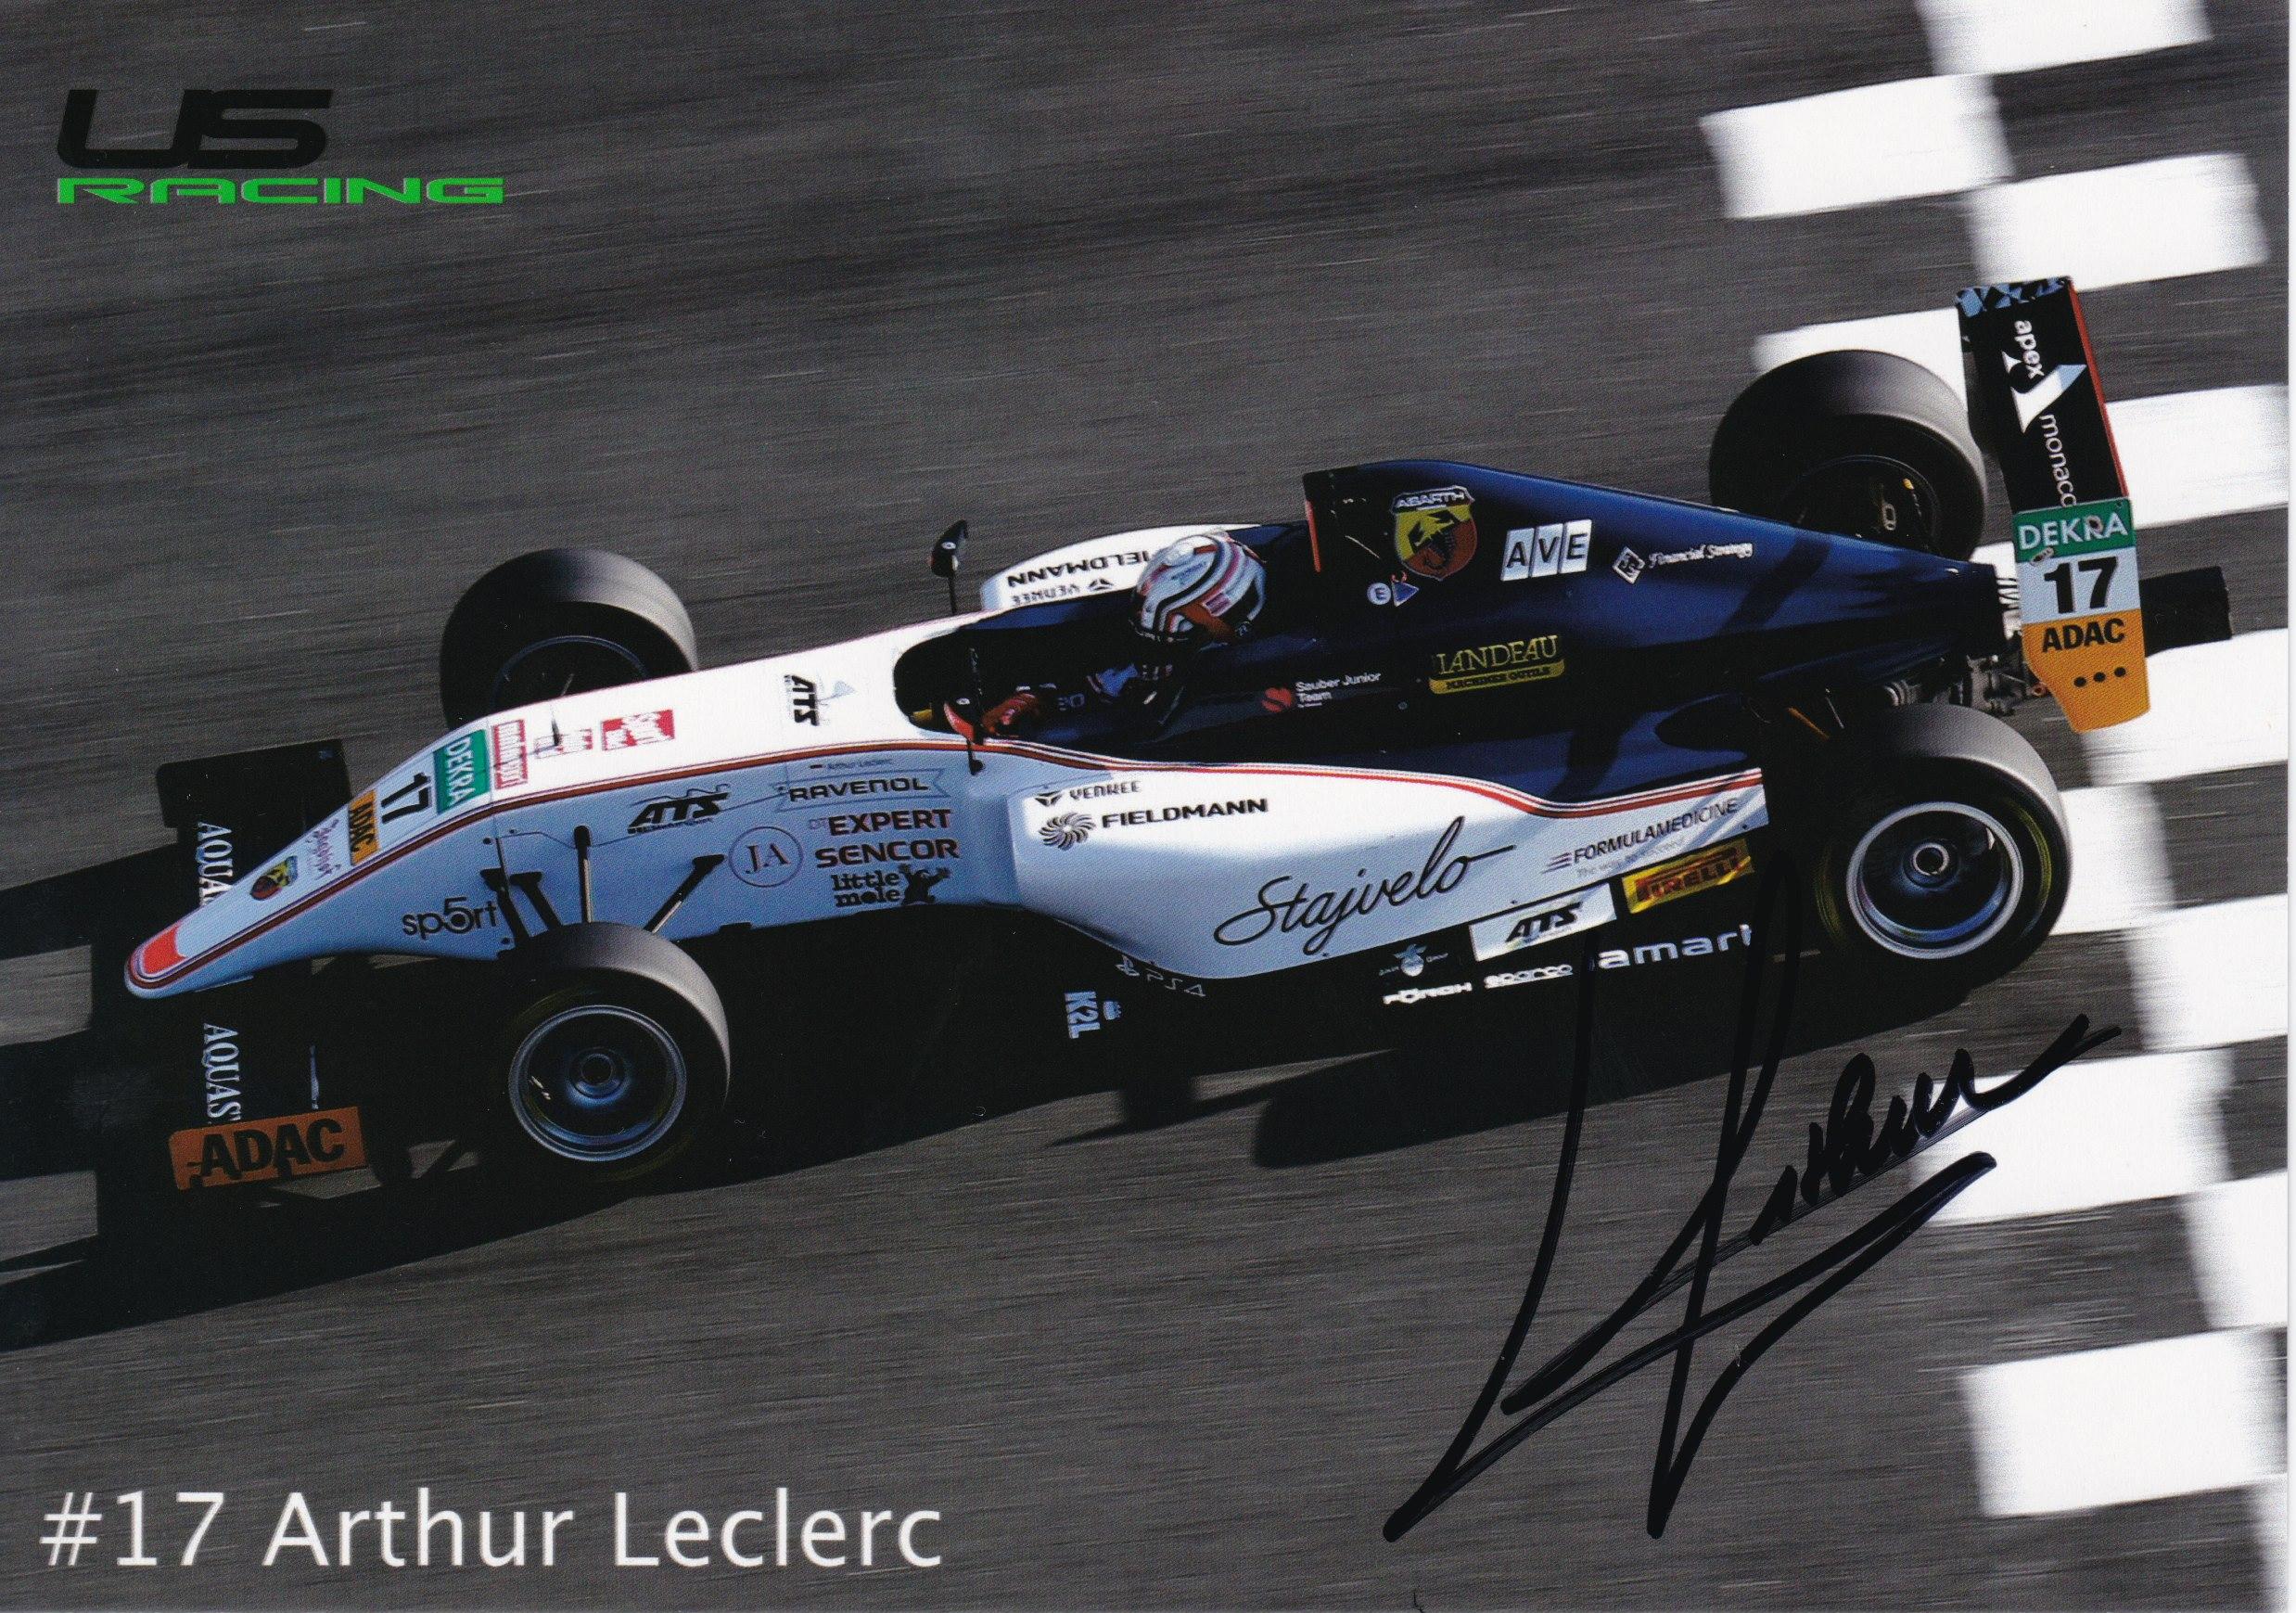 Arthur Leclerc US Racing 2019 Card